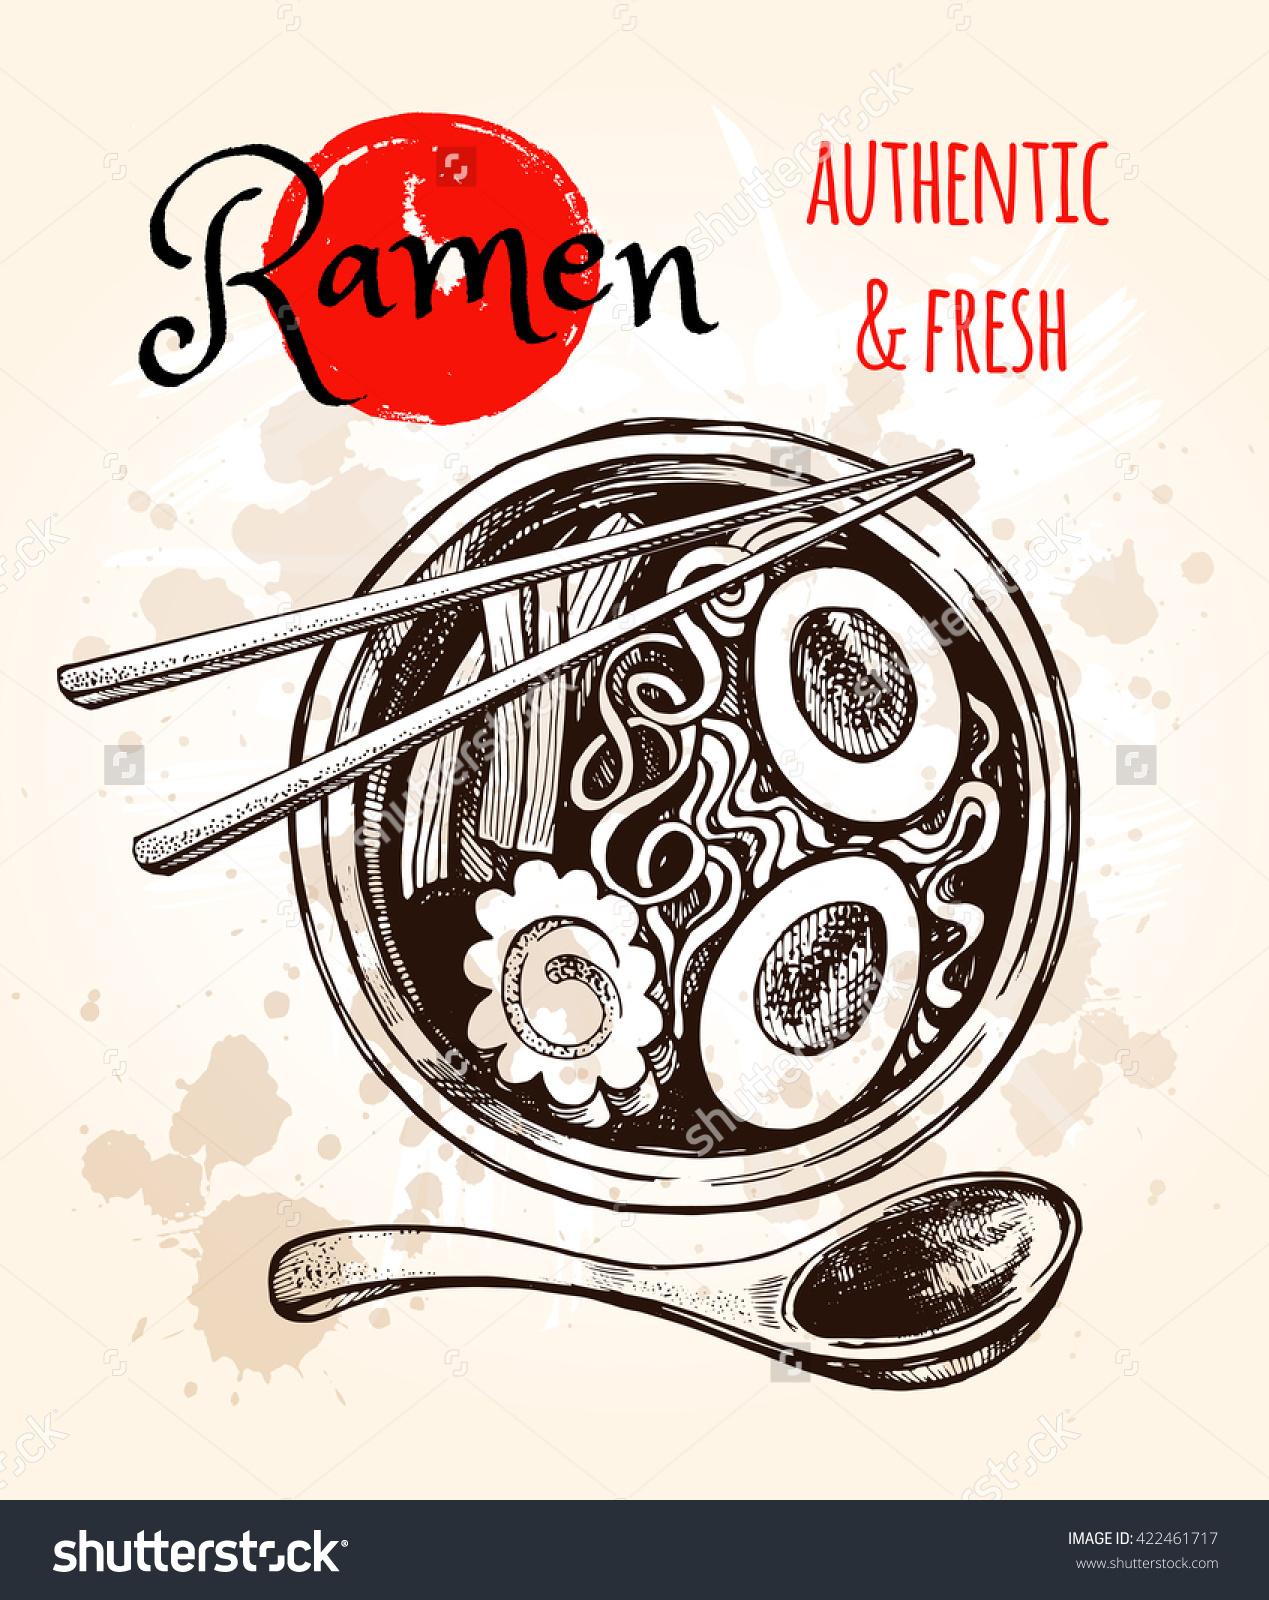 Japanese Cuisine Soup Ramen Vector Hand Stock Vector 422461717.